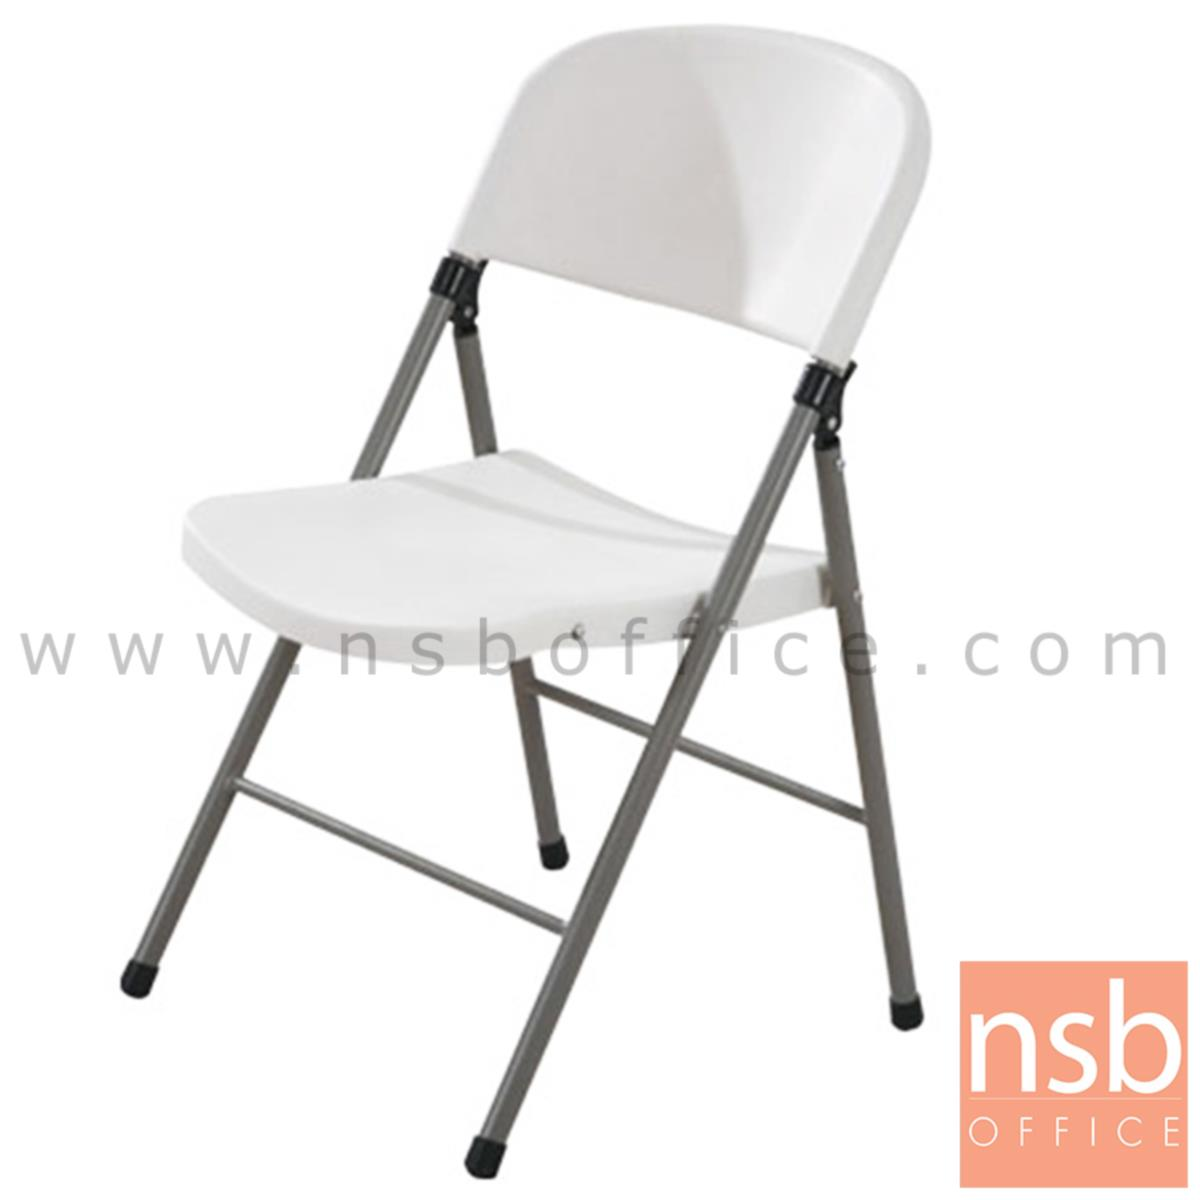 A19A028:เก้าอี้พับที่นั่งพลาสติก รุ่น Ikon (ไอคอน) ขาอีพ็อกซี่เกล็ดเงิน